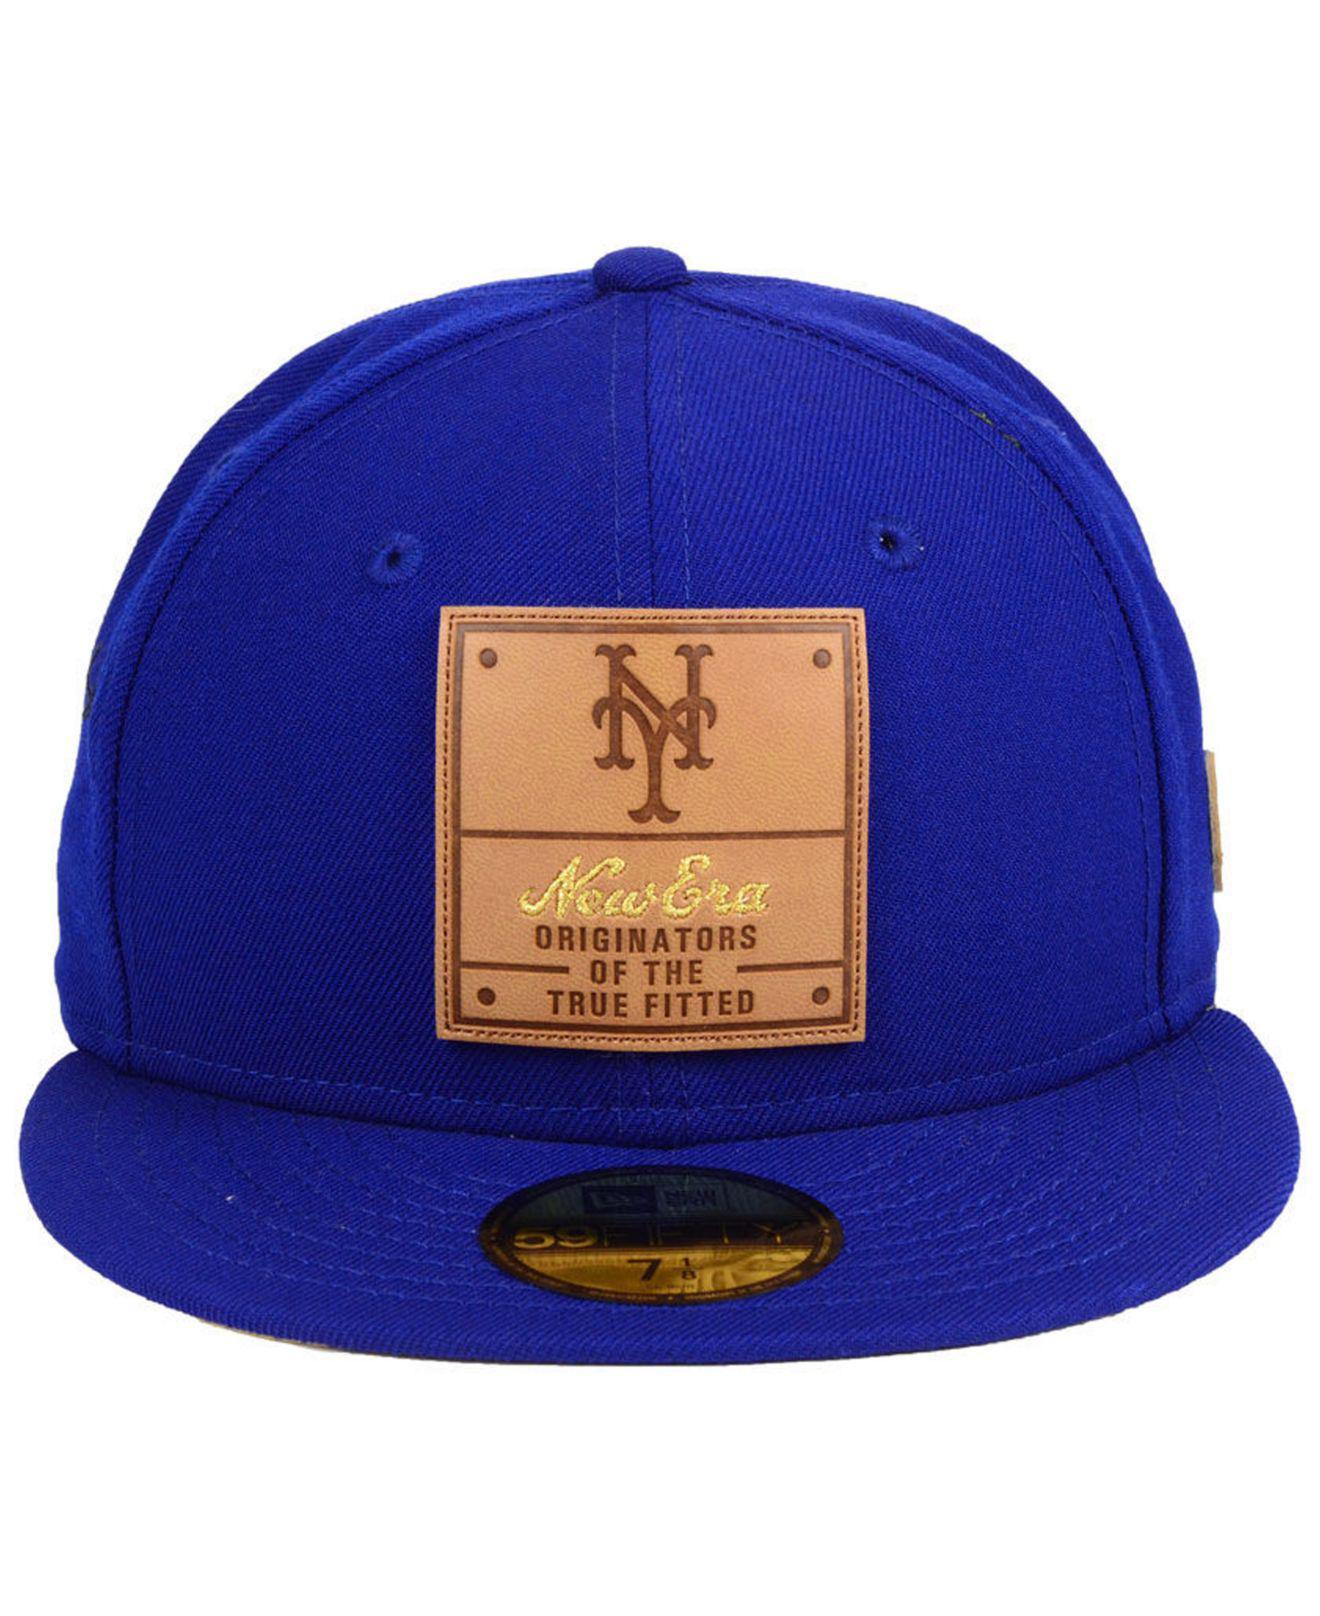 Dodger Hats Lids: Usa Los Angeles Dodgers New Era Mlb Turn To The Future